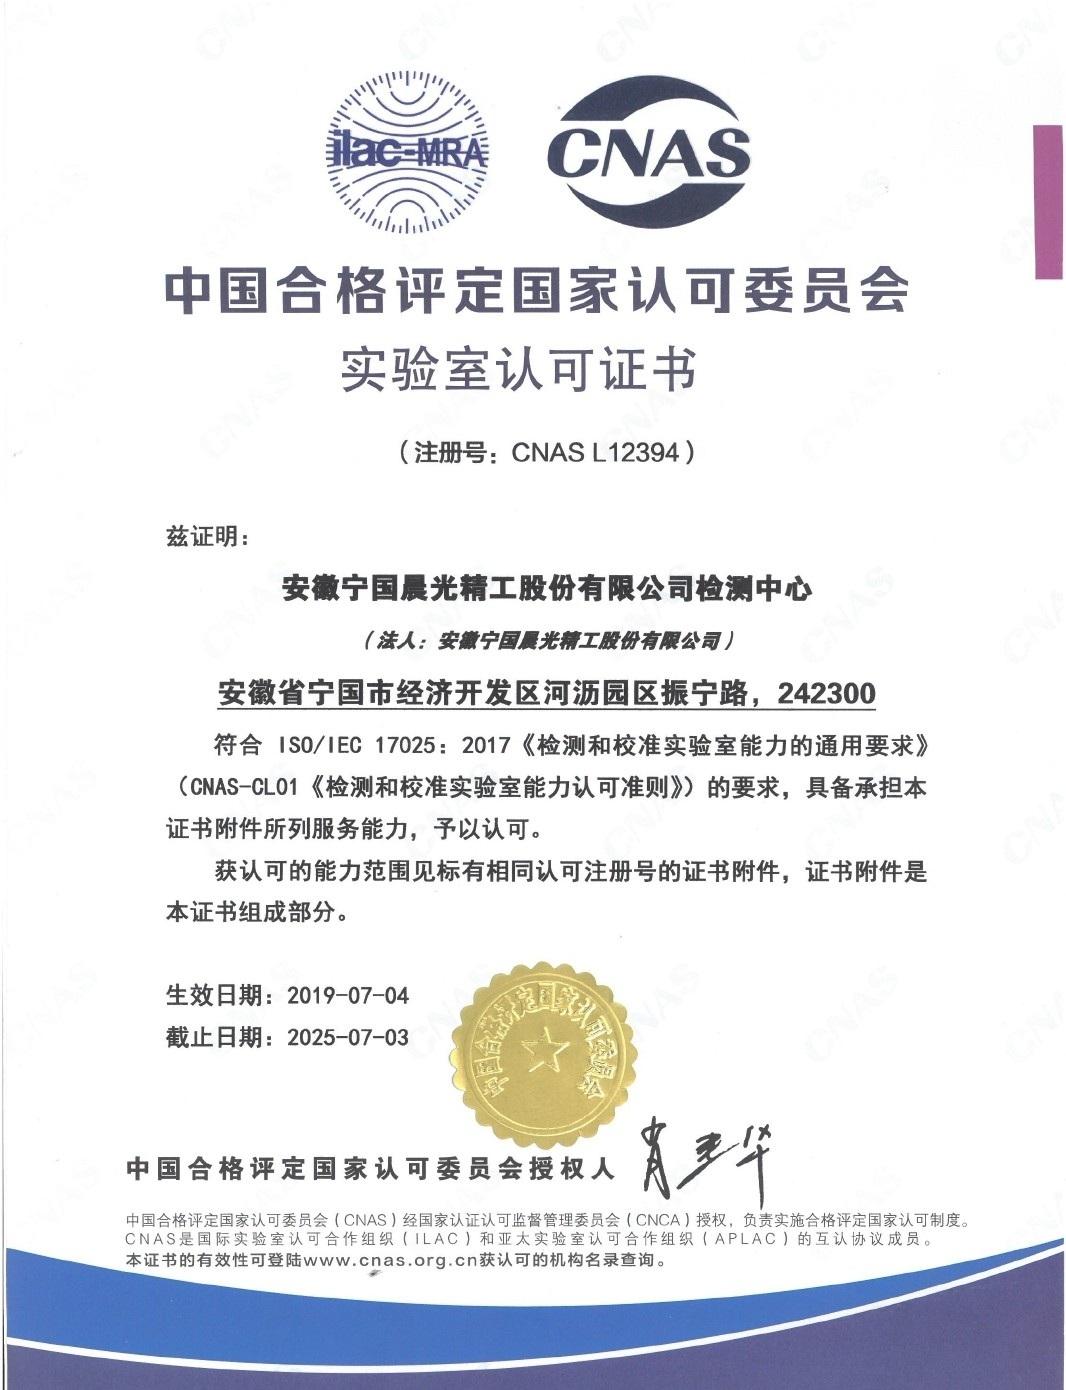 CNAS實驗室認可證書-中文版_page_1